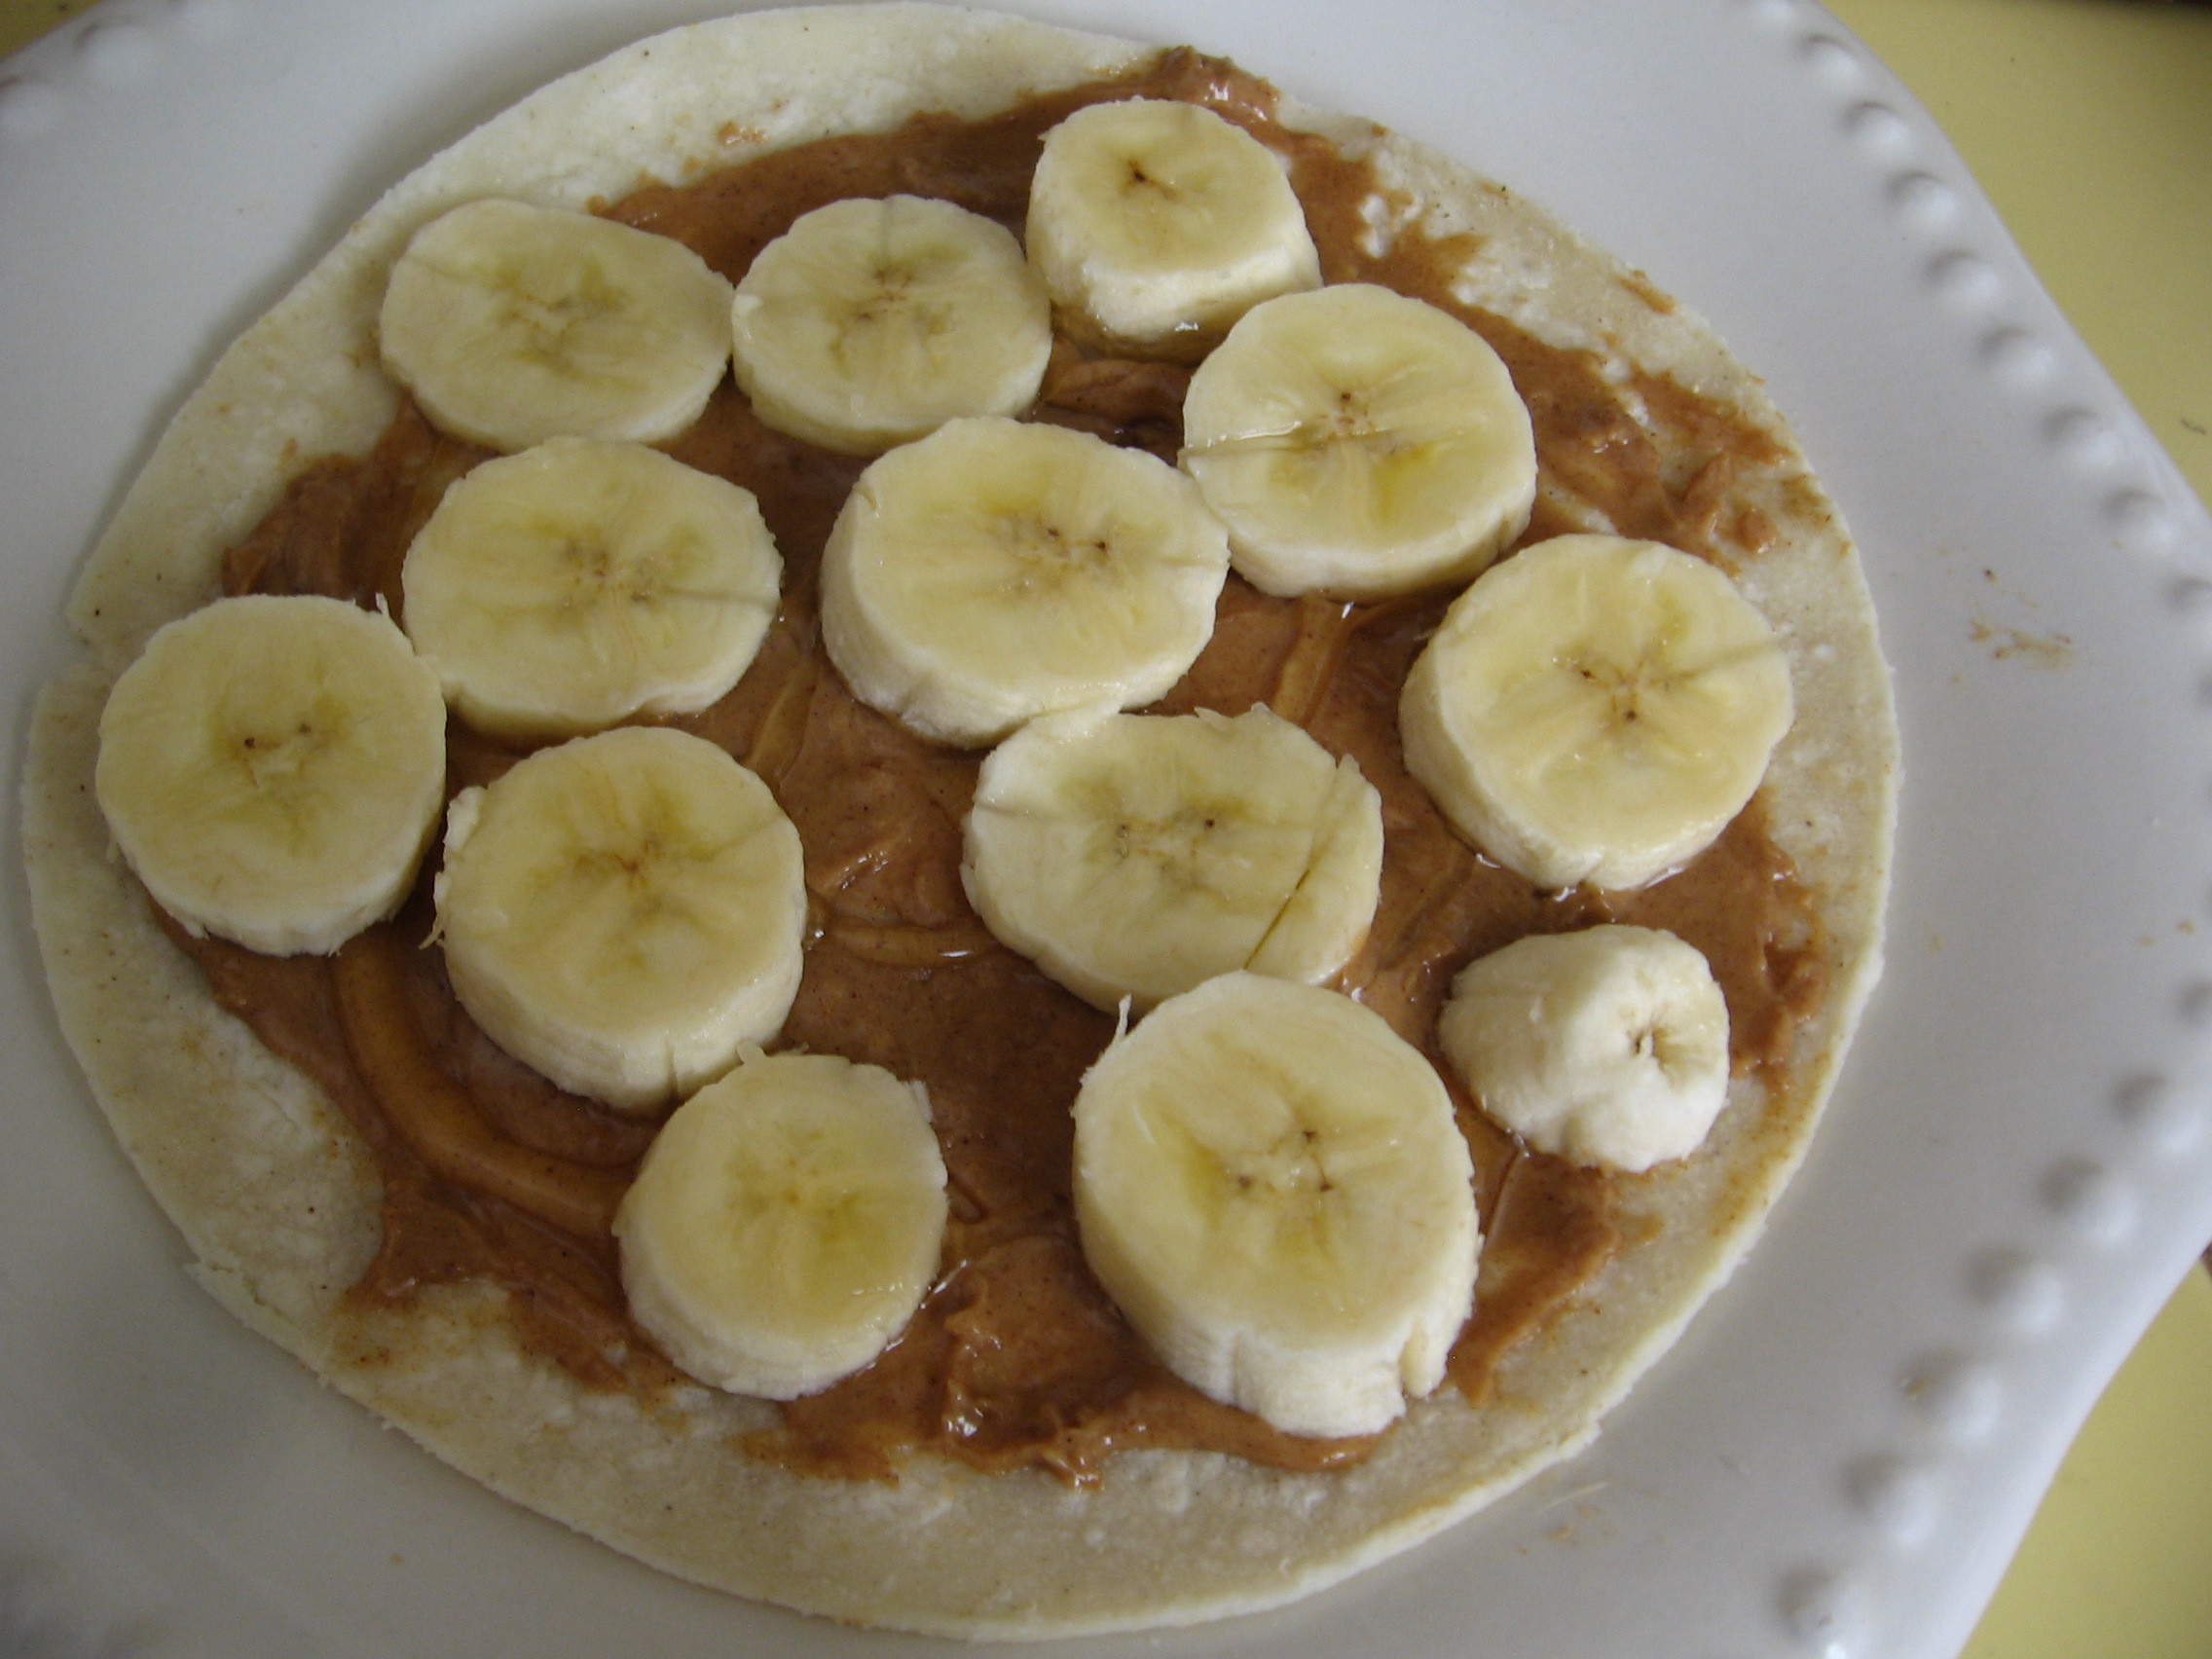 Healthy Peanut Butter Snacks  Healthy Snack – Peanut Butter Banana Quesadilla